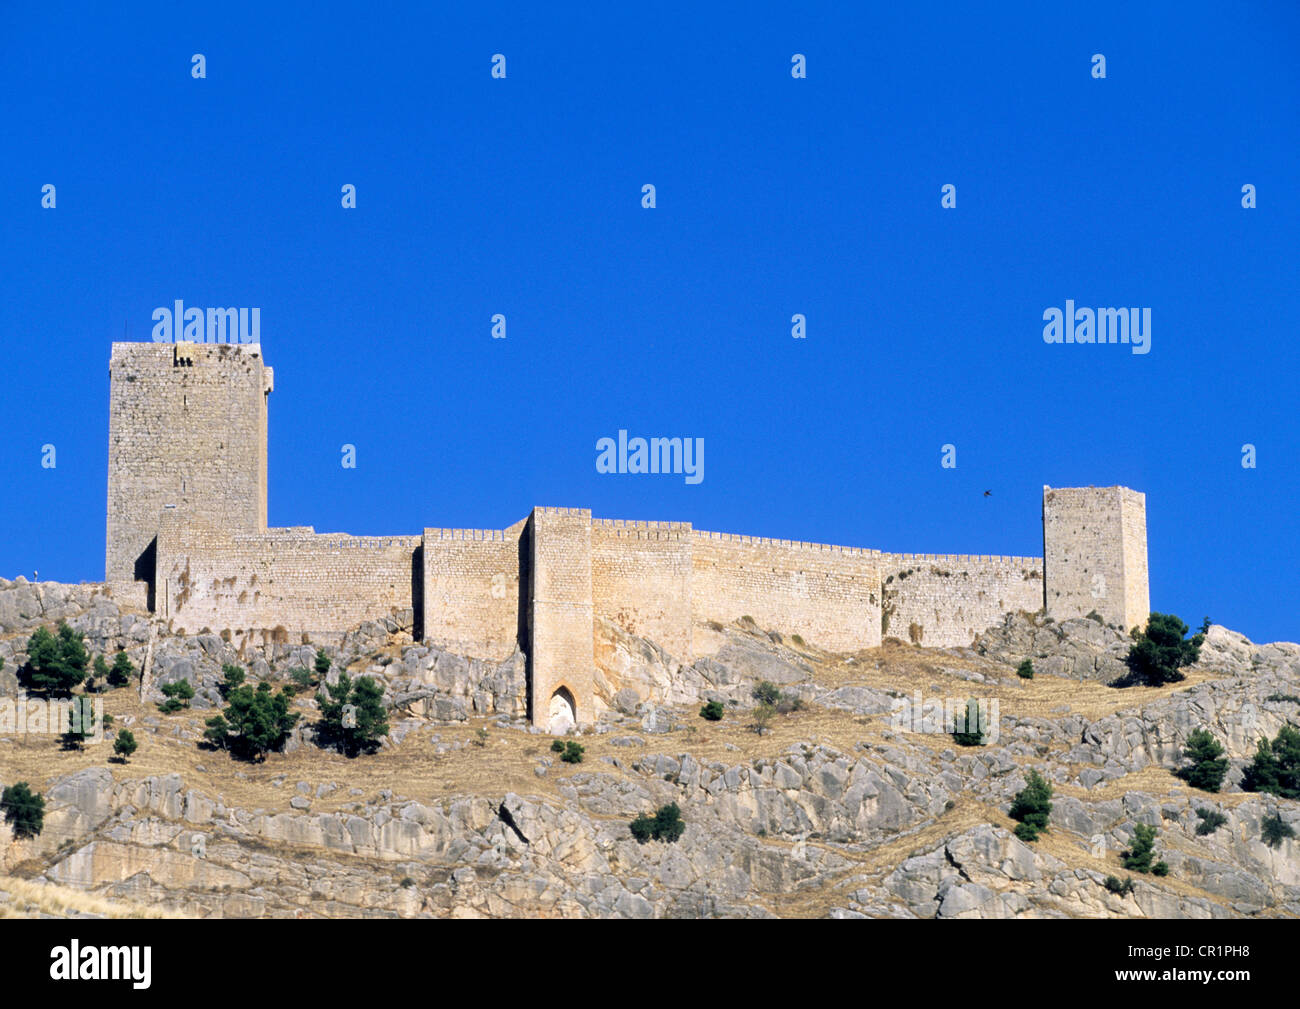 Spain, Andalusia, Jaen region , castle-Parador (hotel) of Santa Catalina Stock Photo